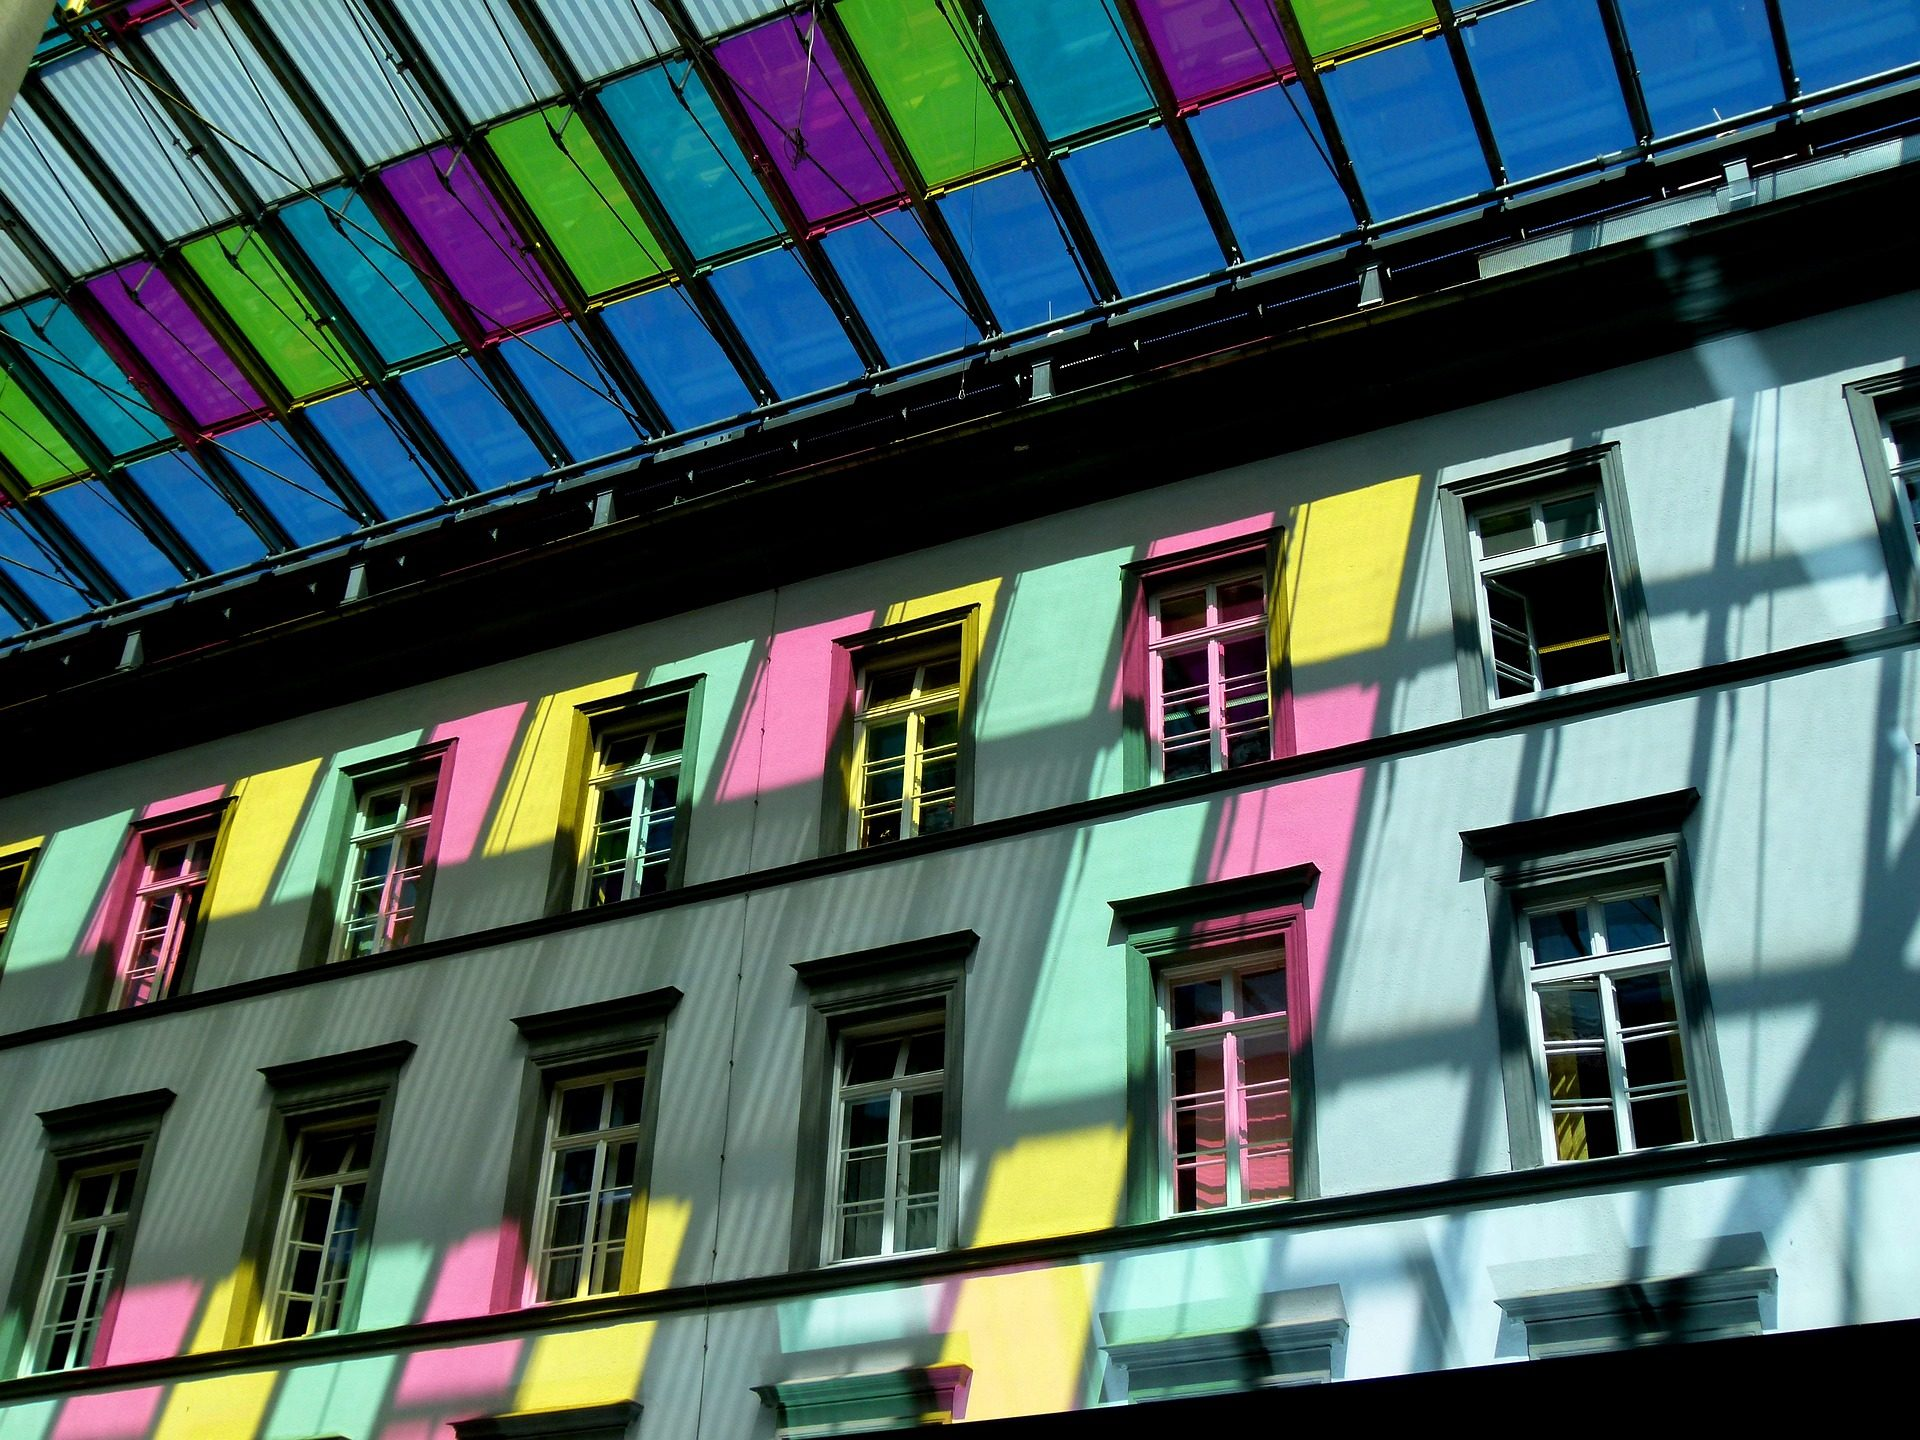 Windows, κτίριο, φώτα, πολύχρωμο, Μωσαϊκό, πρόσοψη - Wallpapers HD - Professor-falken.com